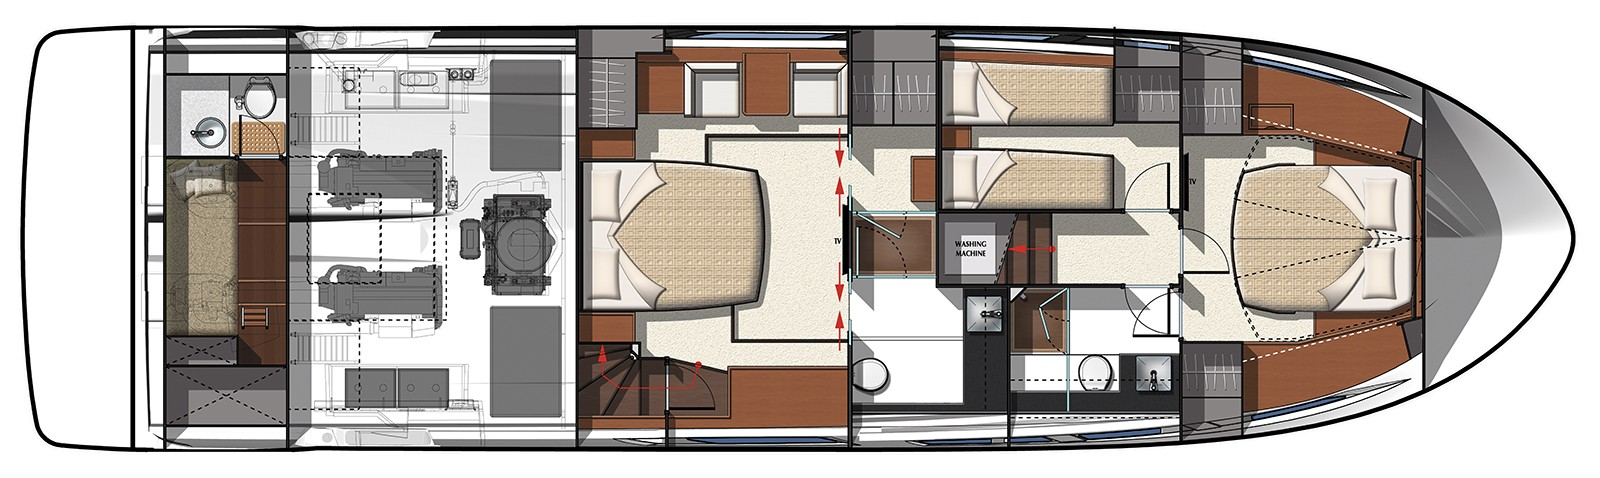 P560-Plan-Lower-deck-2017-